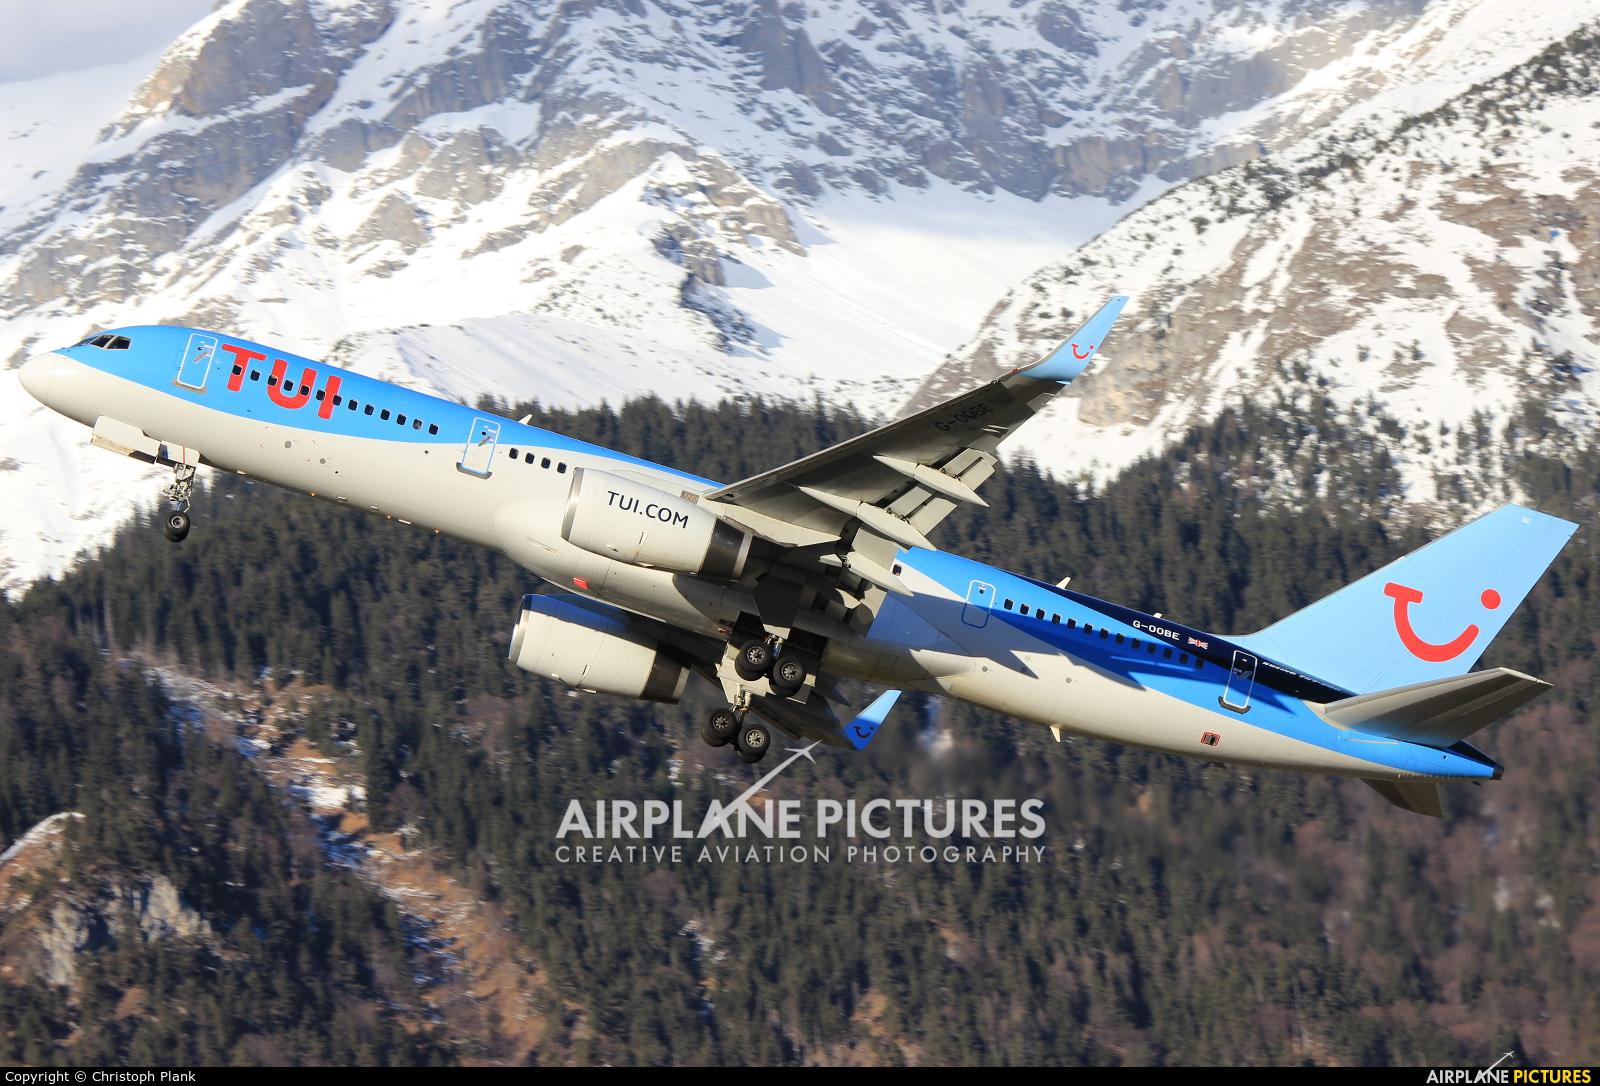 TUI Airways G-OOBE aircraft at Innsbruck